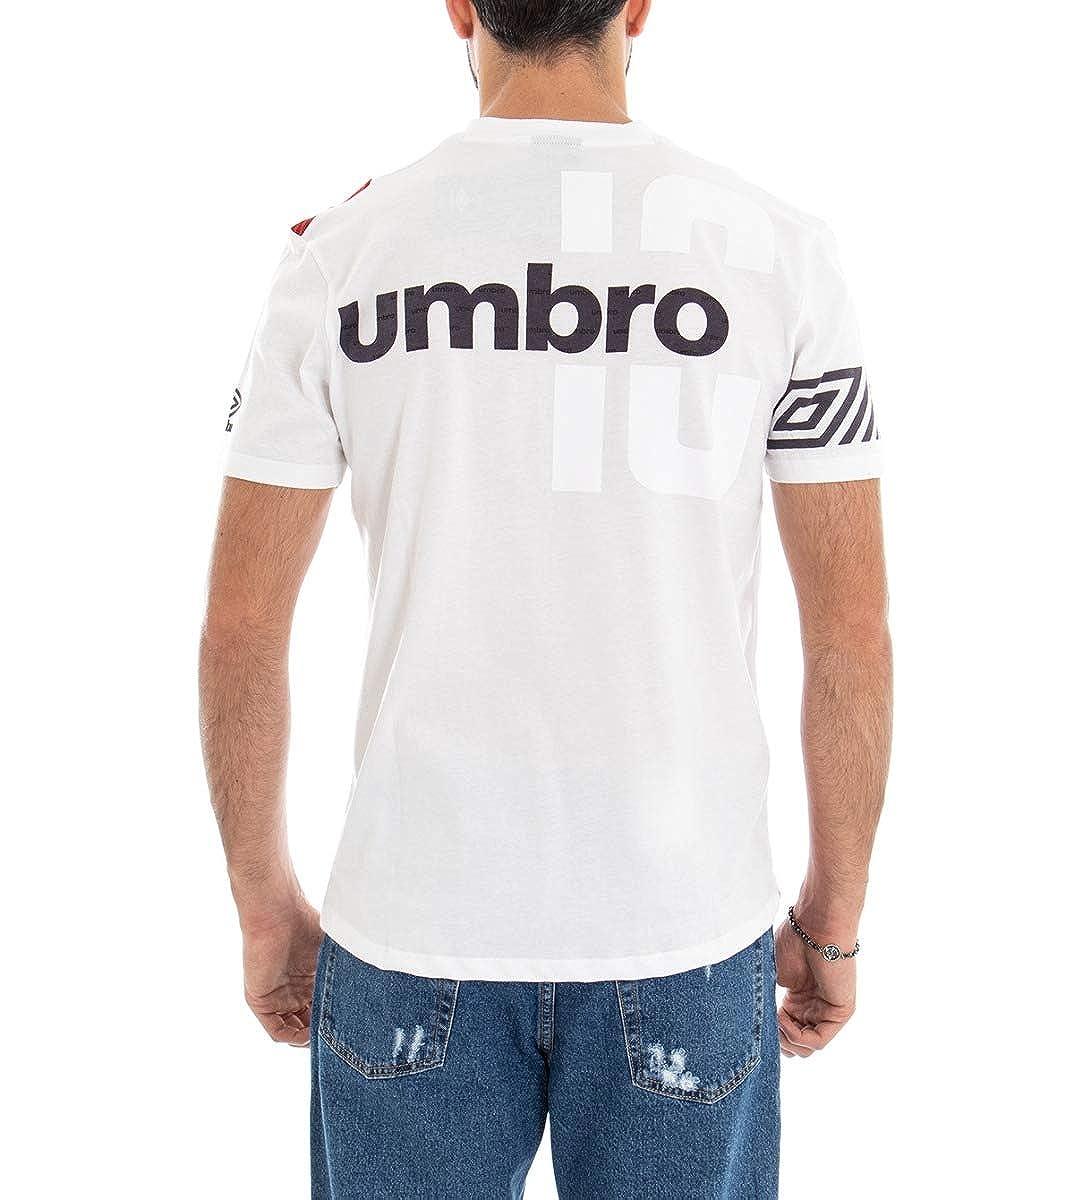 Giosal Camiseta Hombre Umbro Camiseta RAP00068B Blanca impresión ...